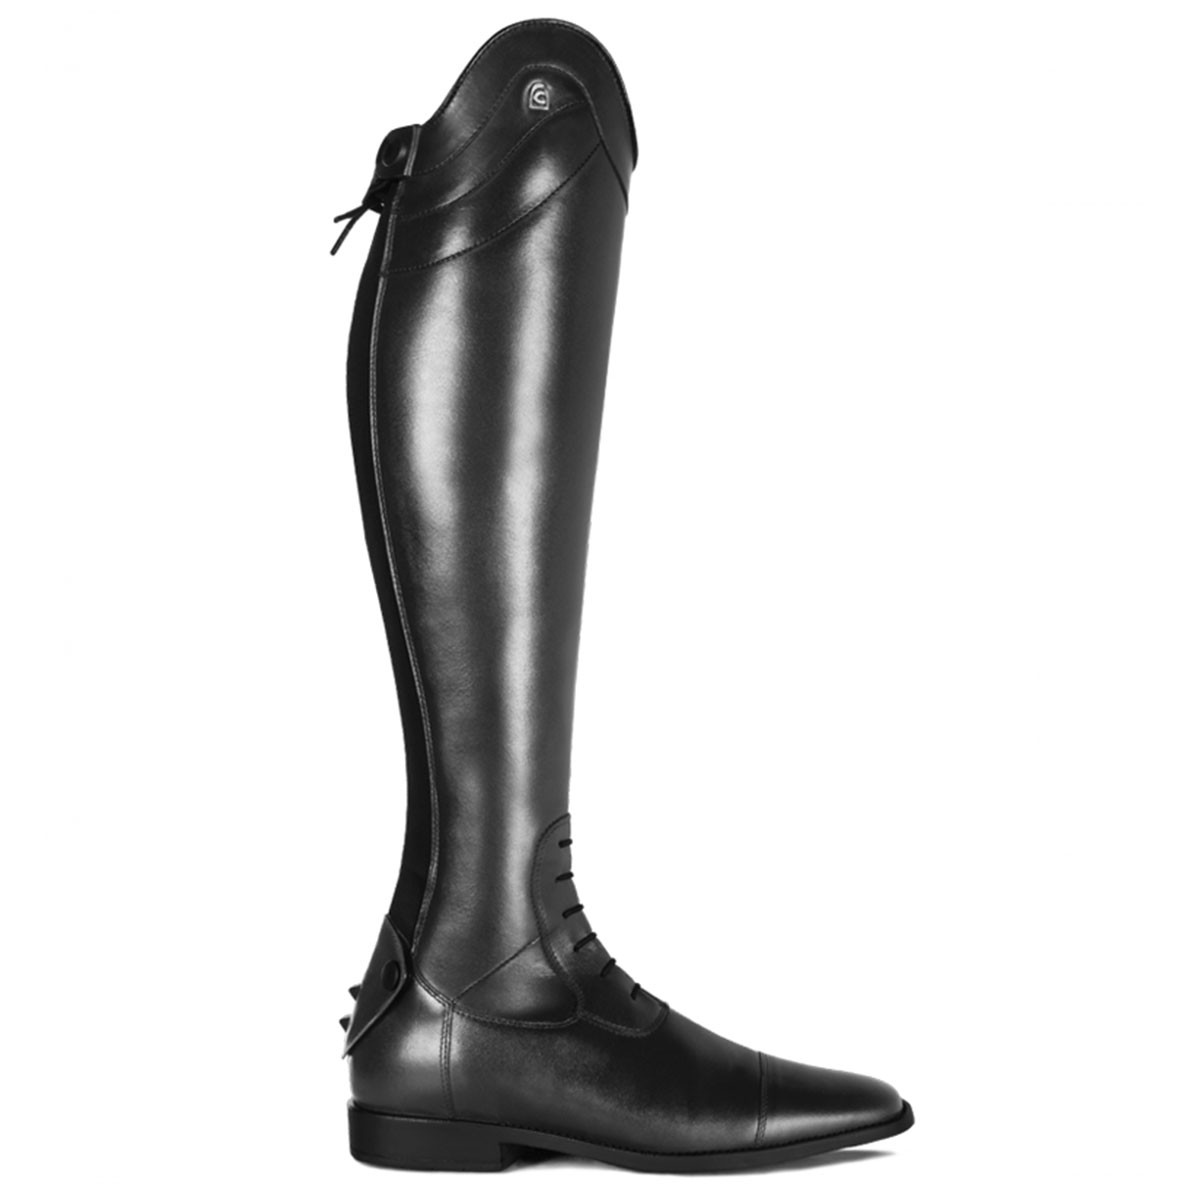 Cavallo Linus Slim rijlaars zwart maat:5-5.5 / h49-w35